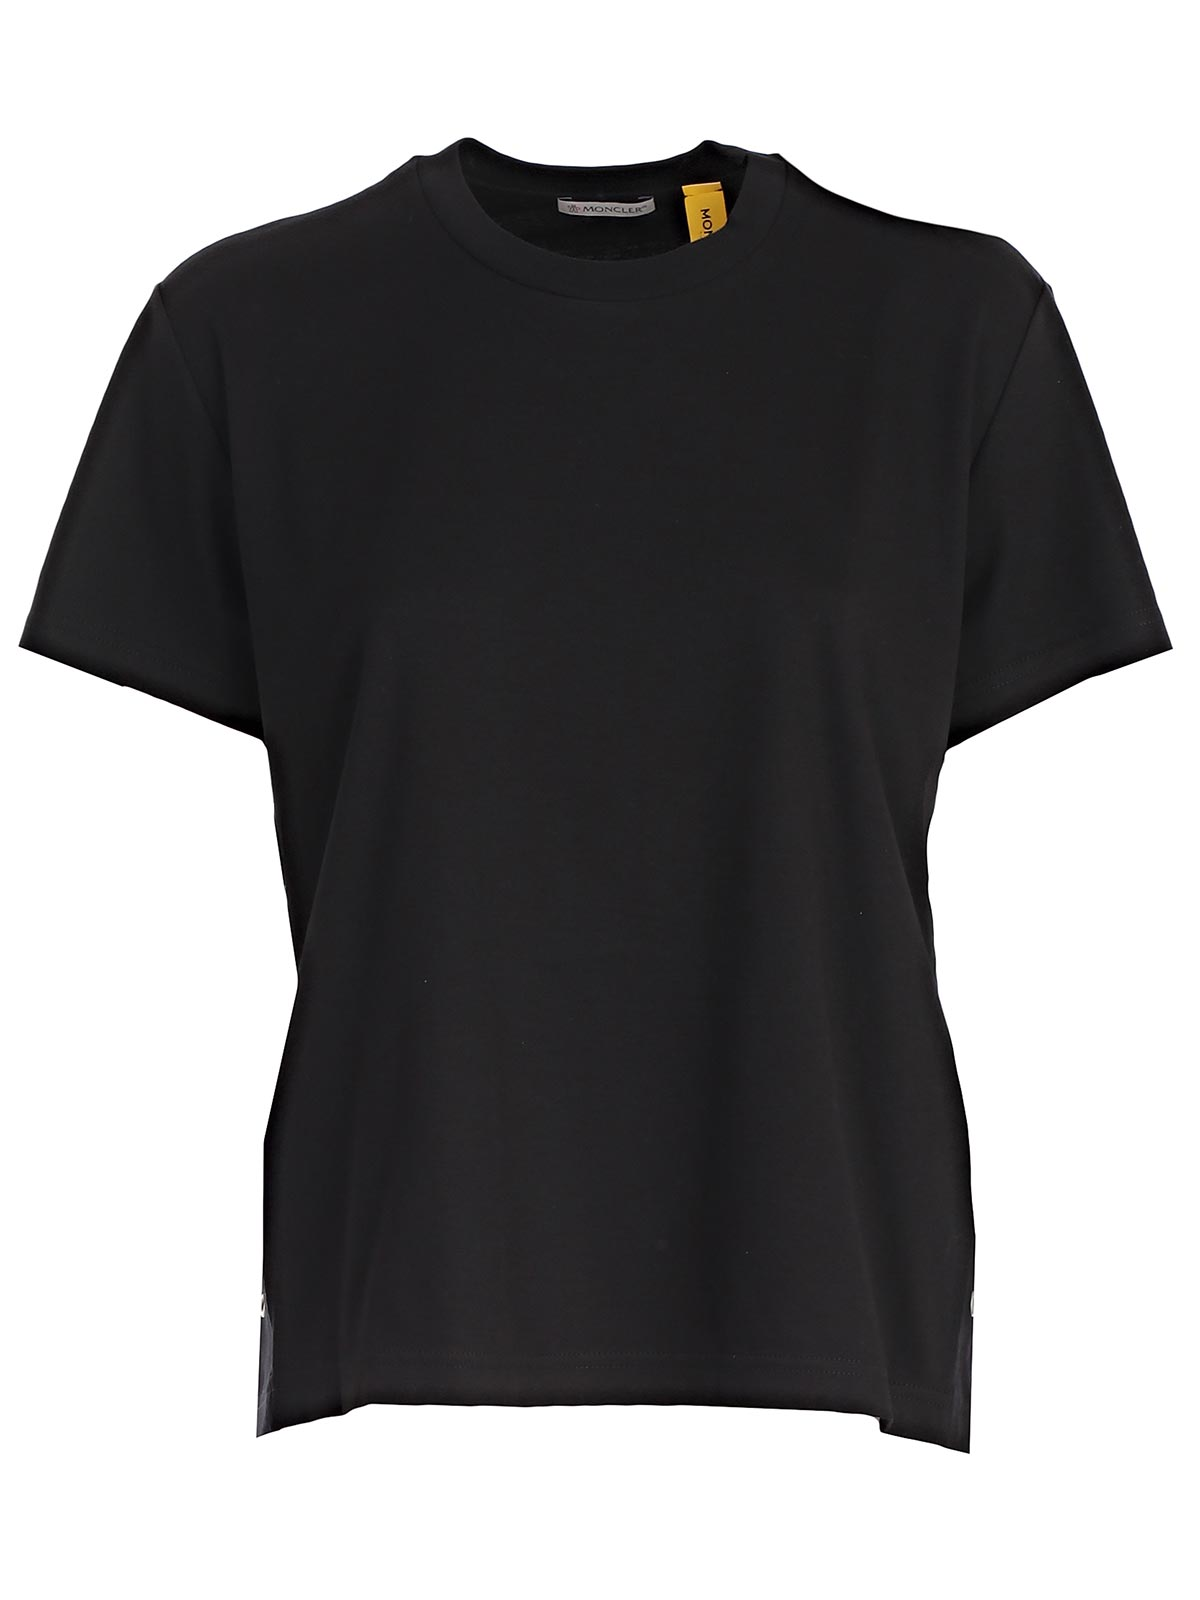 Picture of Moncler Genius T-Shirt